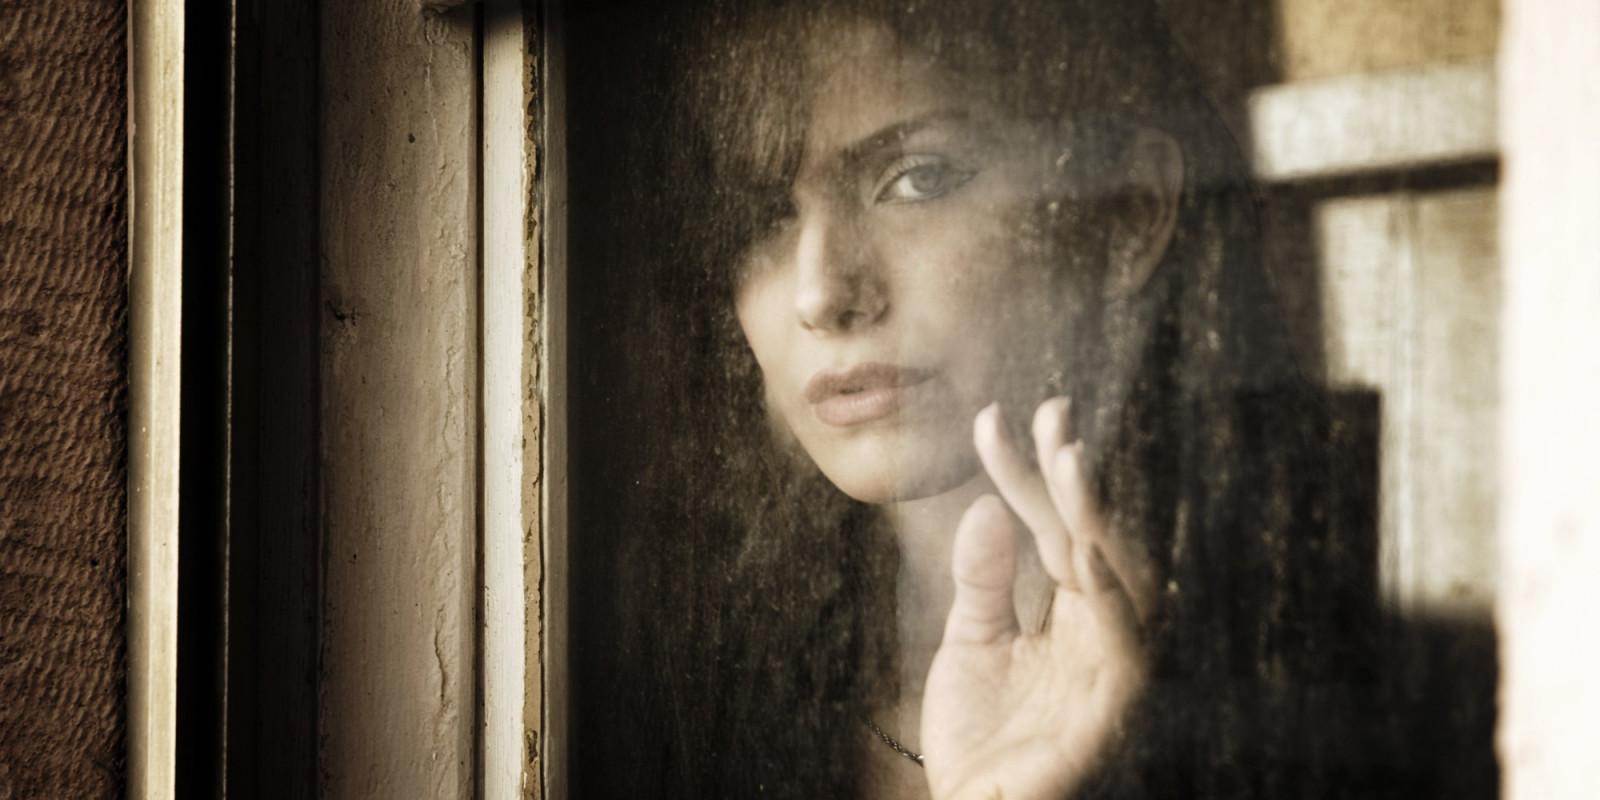 blanco negro mujer modelo retrato ventana Mirando al espectador fotografía Mirando por la ventana Persona cabeza ligero color niña belleza ojo fotografía oscuridad imagen 2000x1000 px Fotografía de retrato